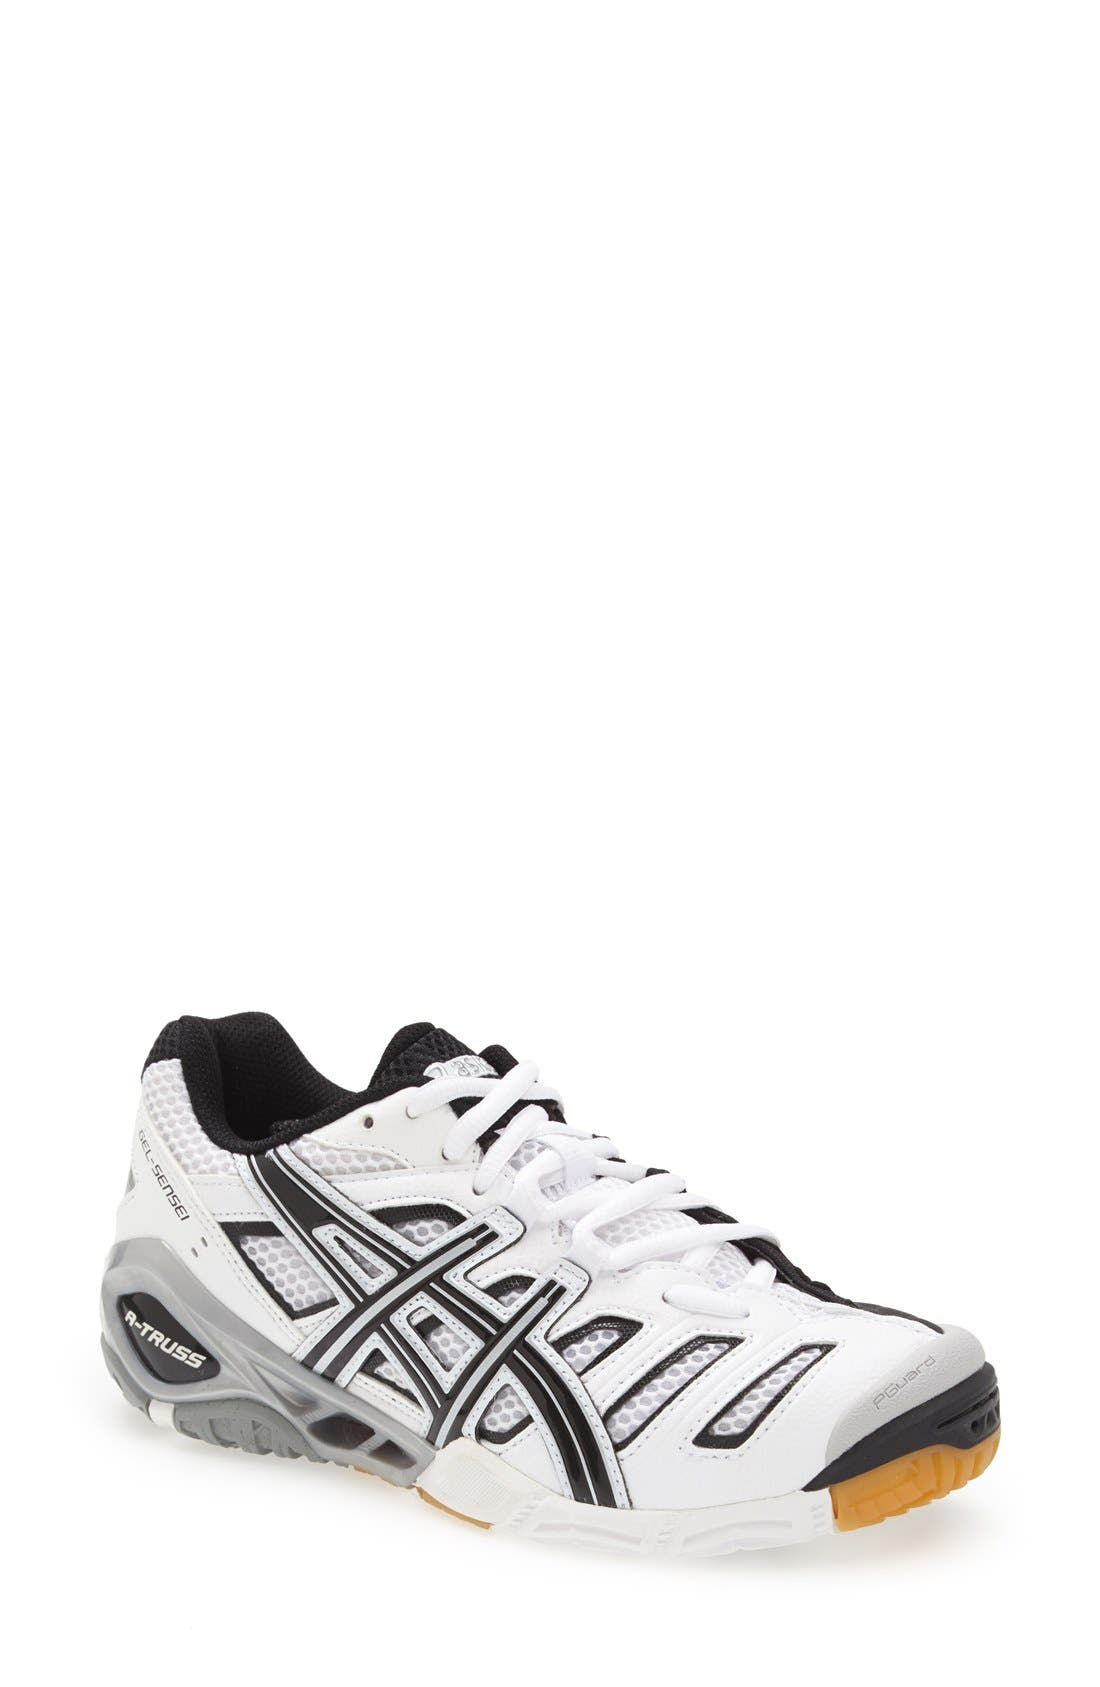 Main Image - ASICS® 'GEL-Sensei 4' Volleyball Shoe (Women)